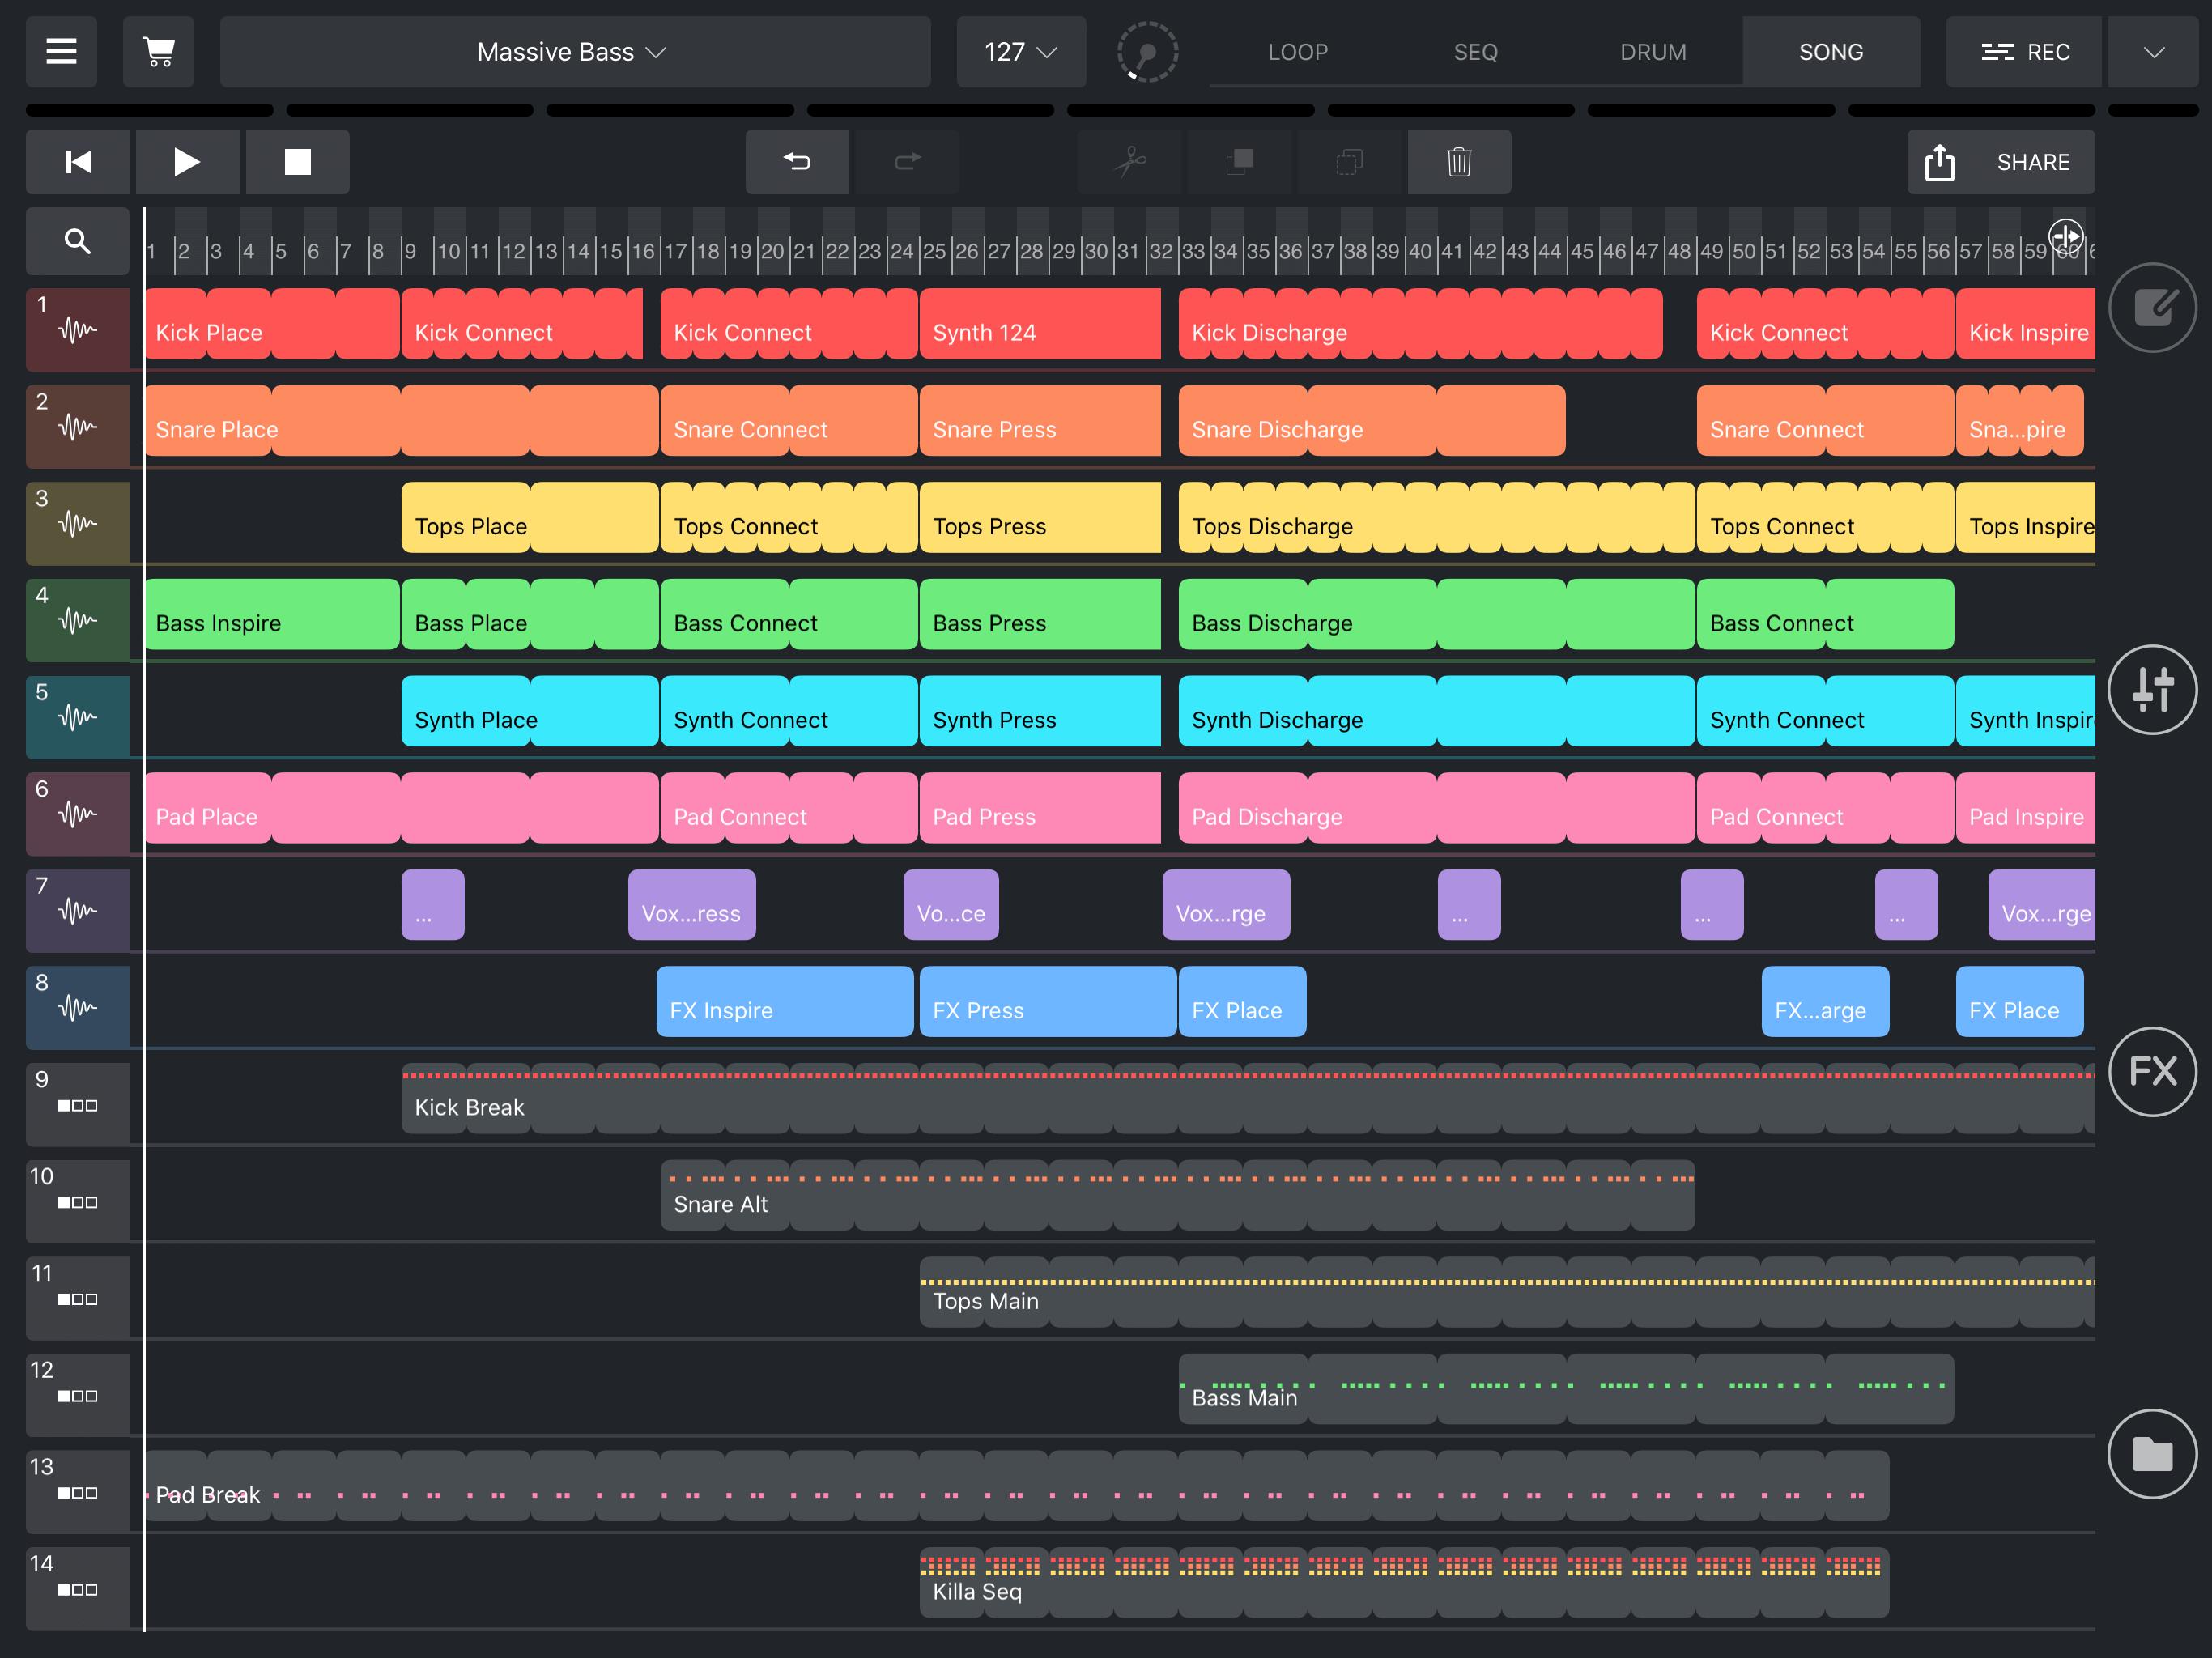 Remixlive's Song mode